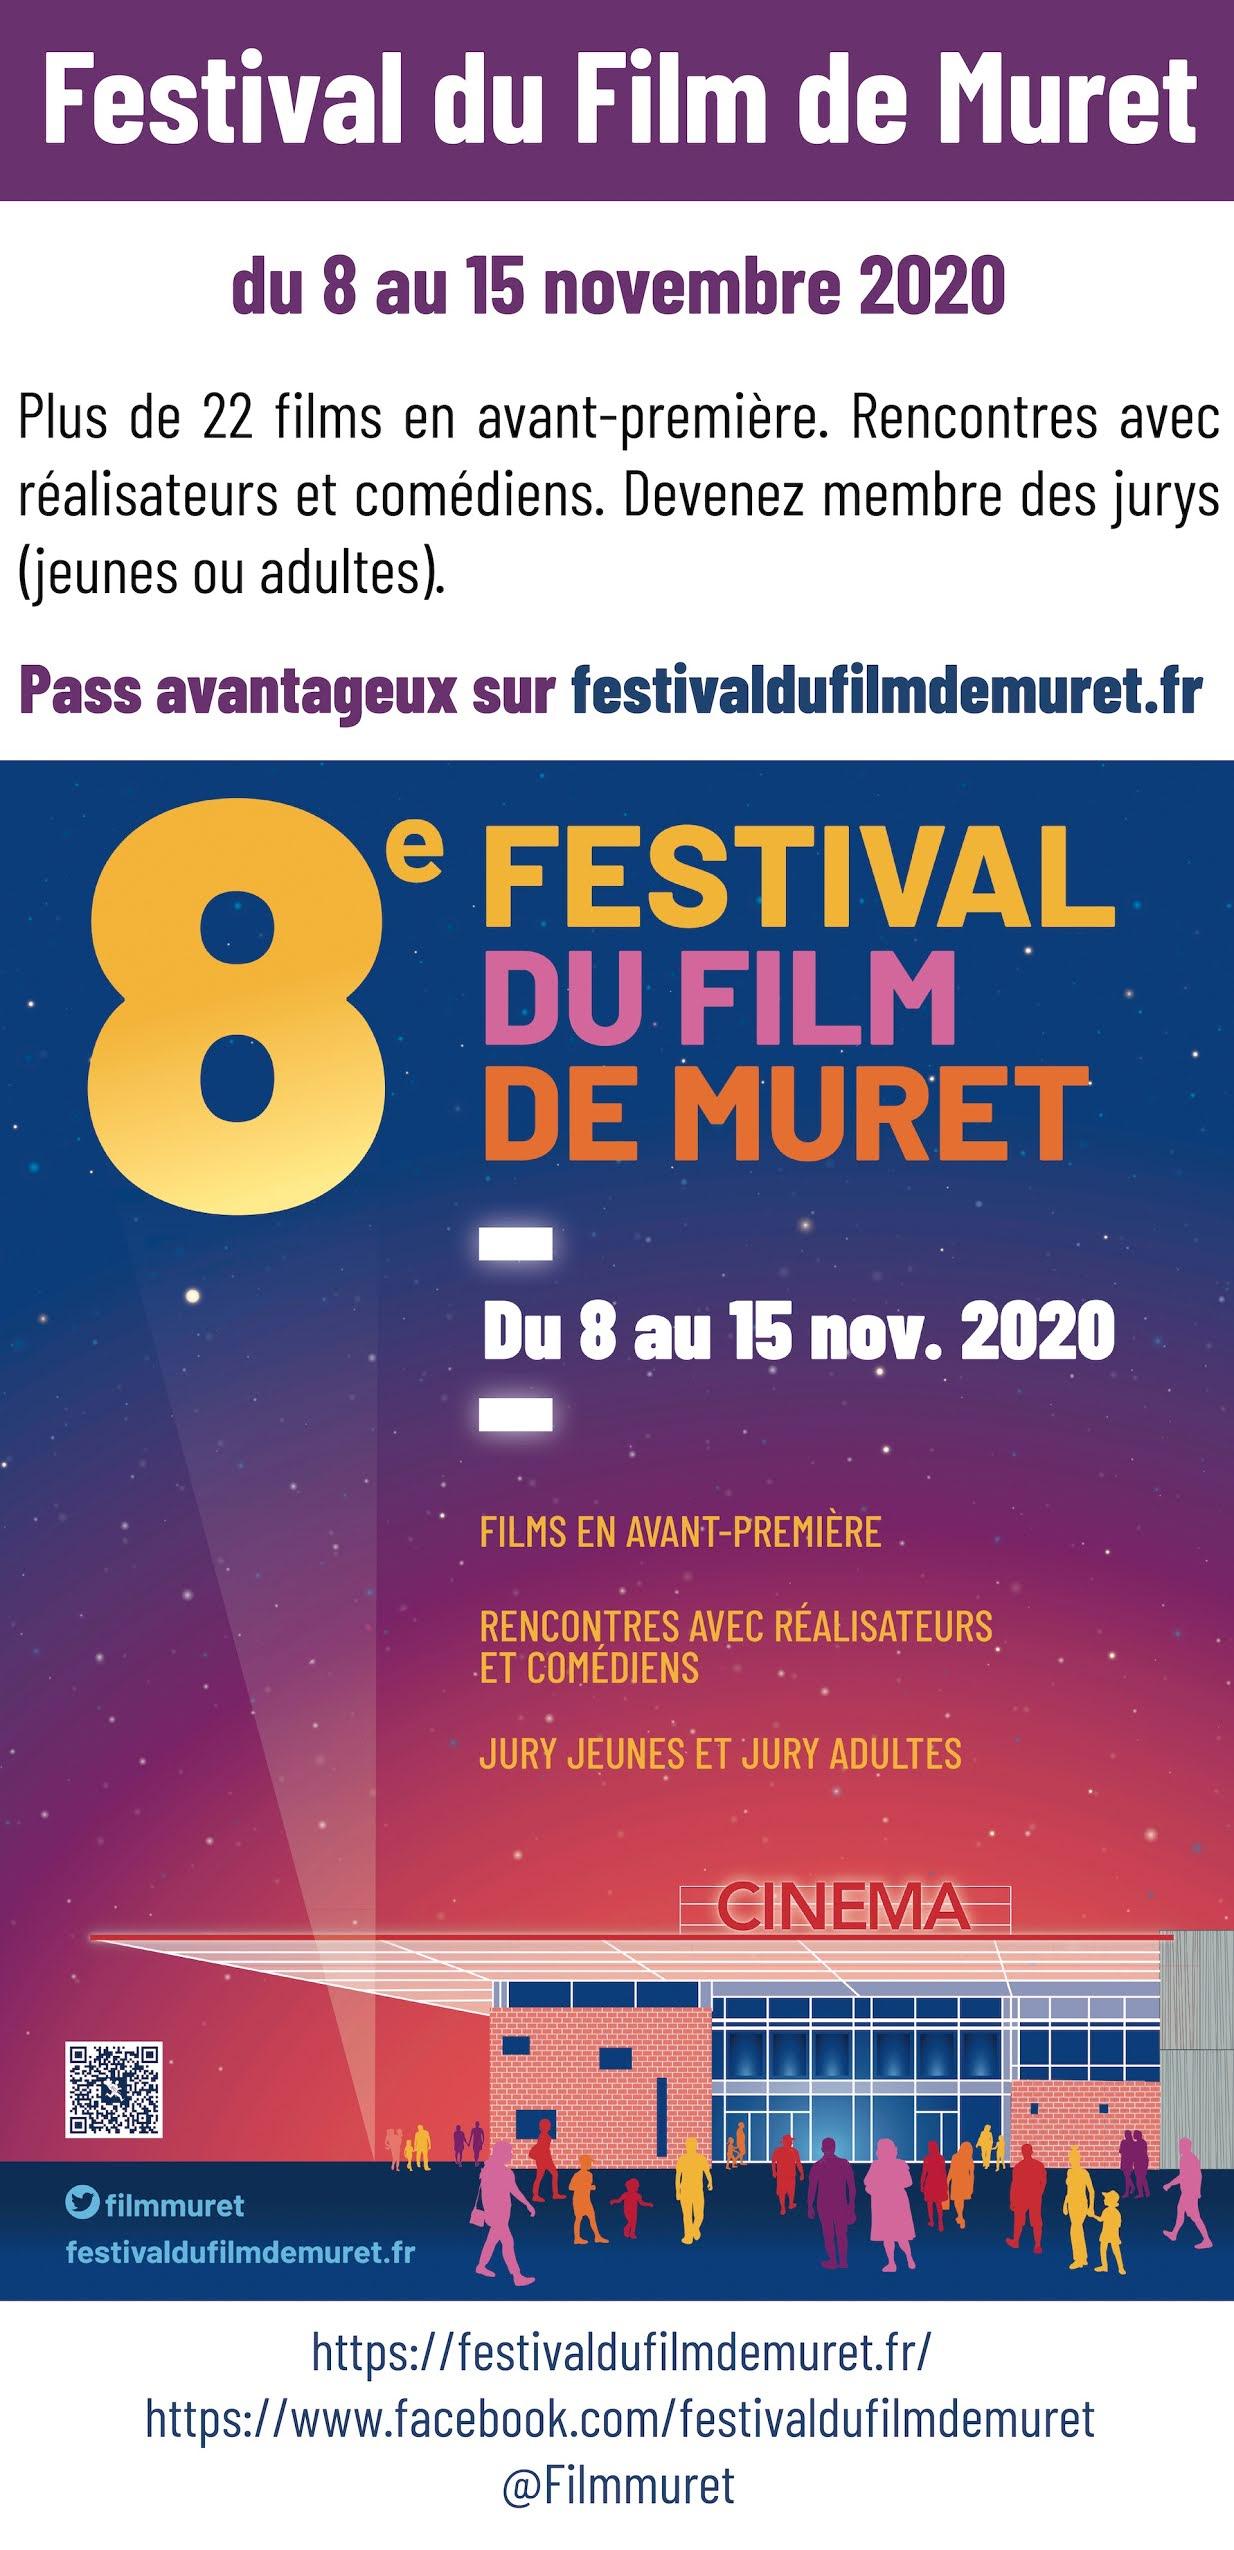 Festival du Film de Muret